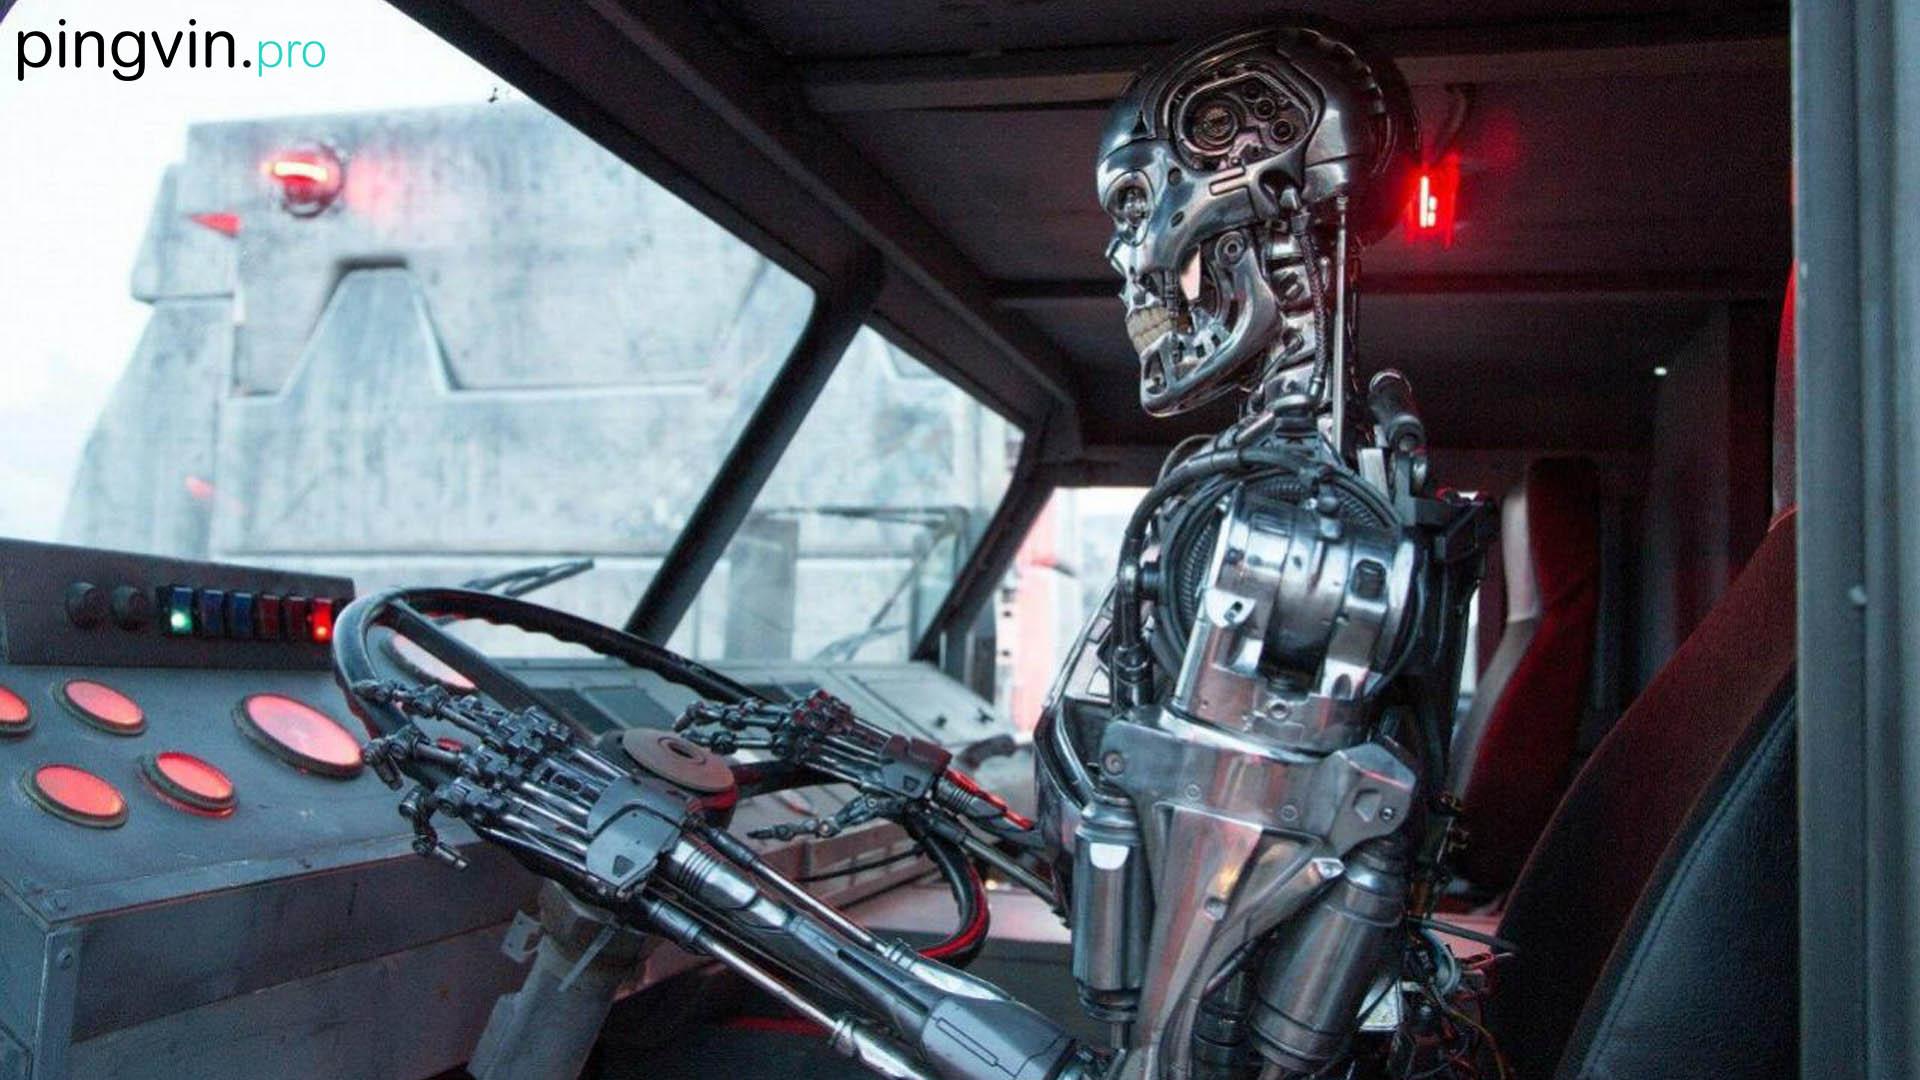 jason the robotic machine